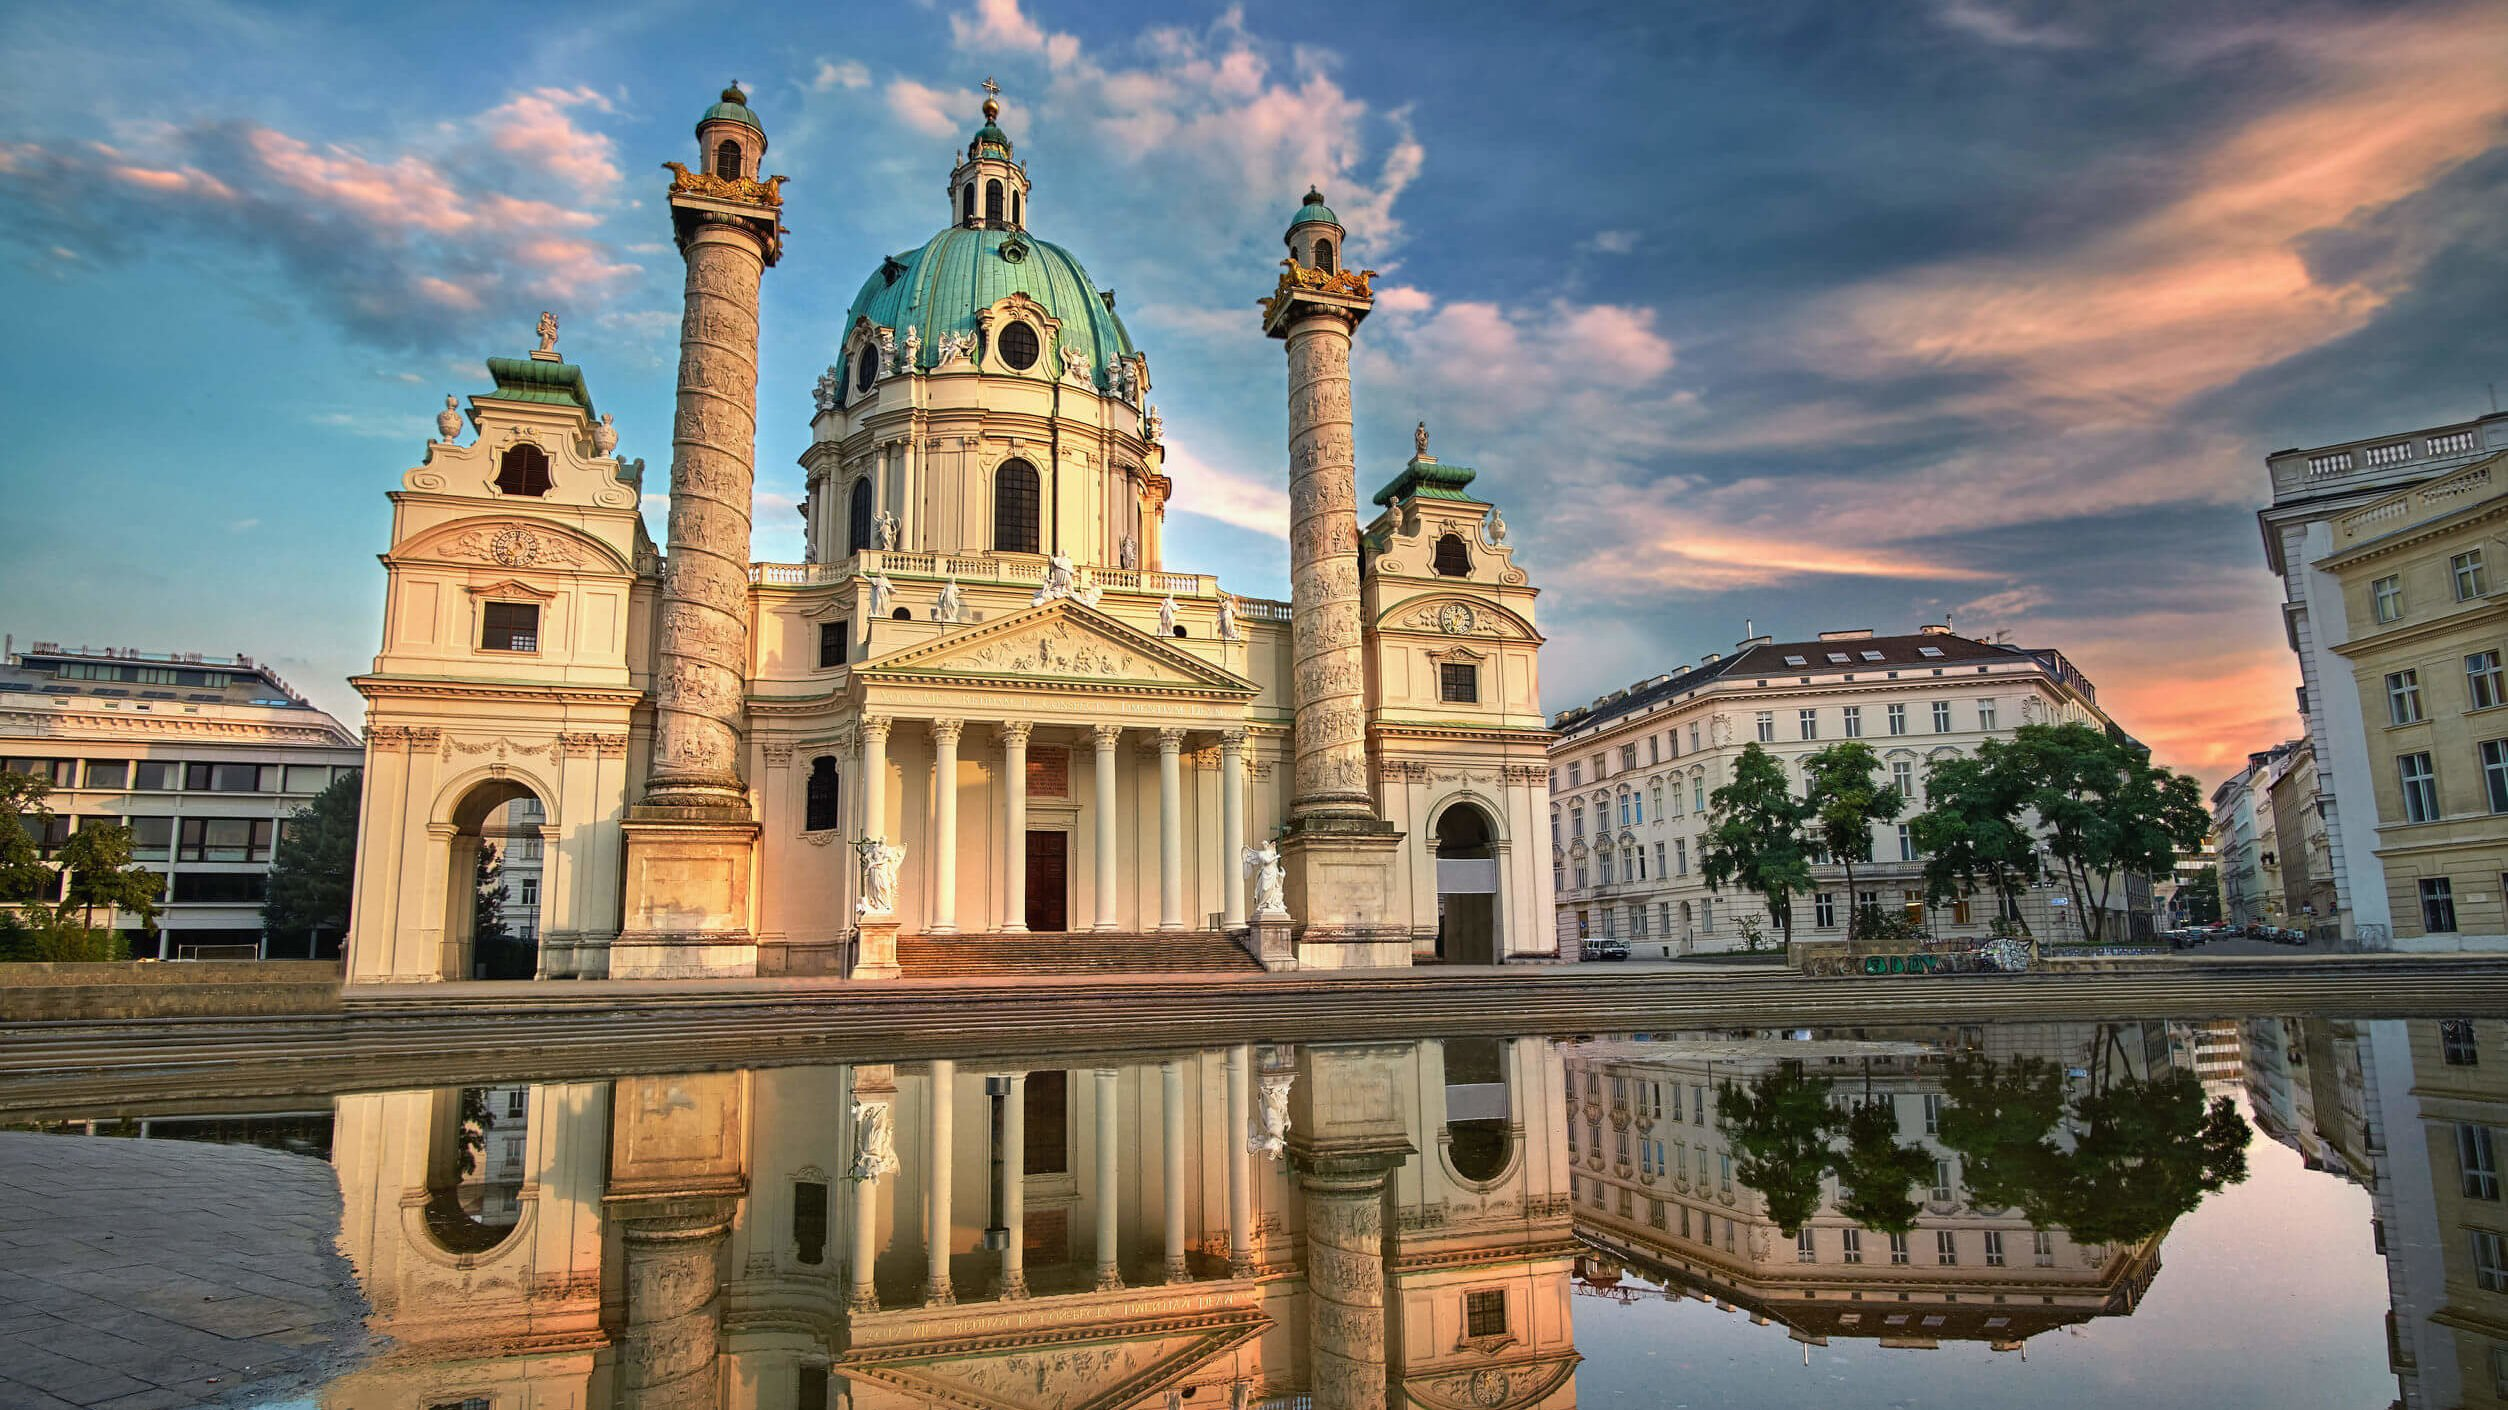 Wonen en werken in Wenen als digital nomad